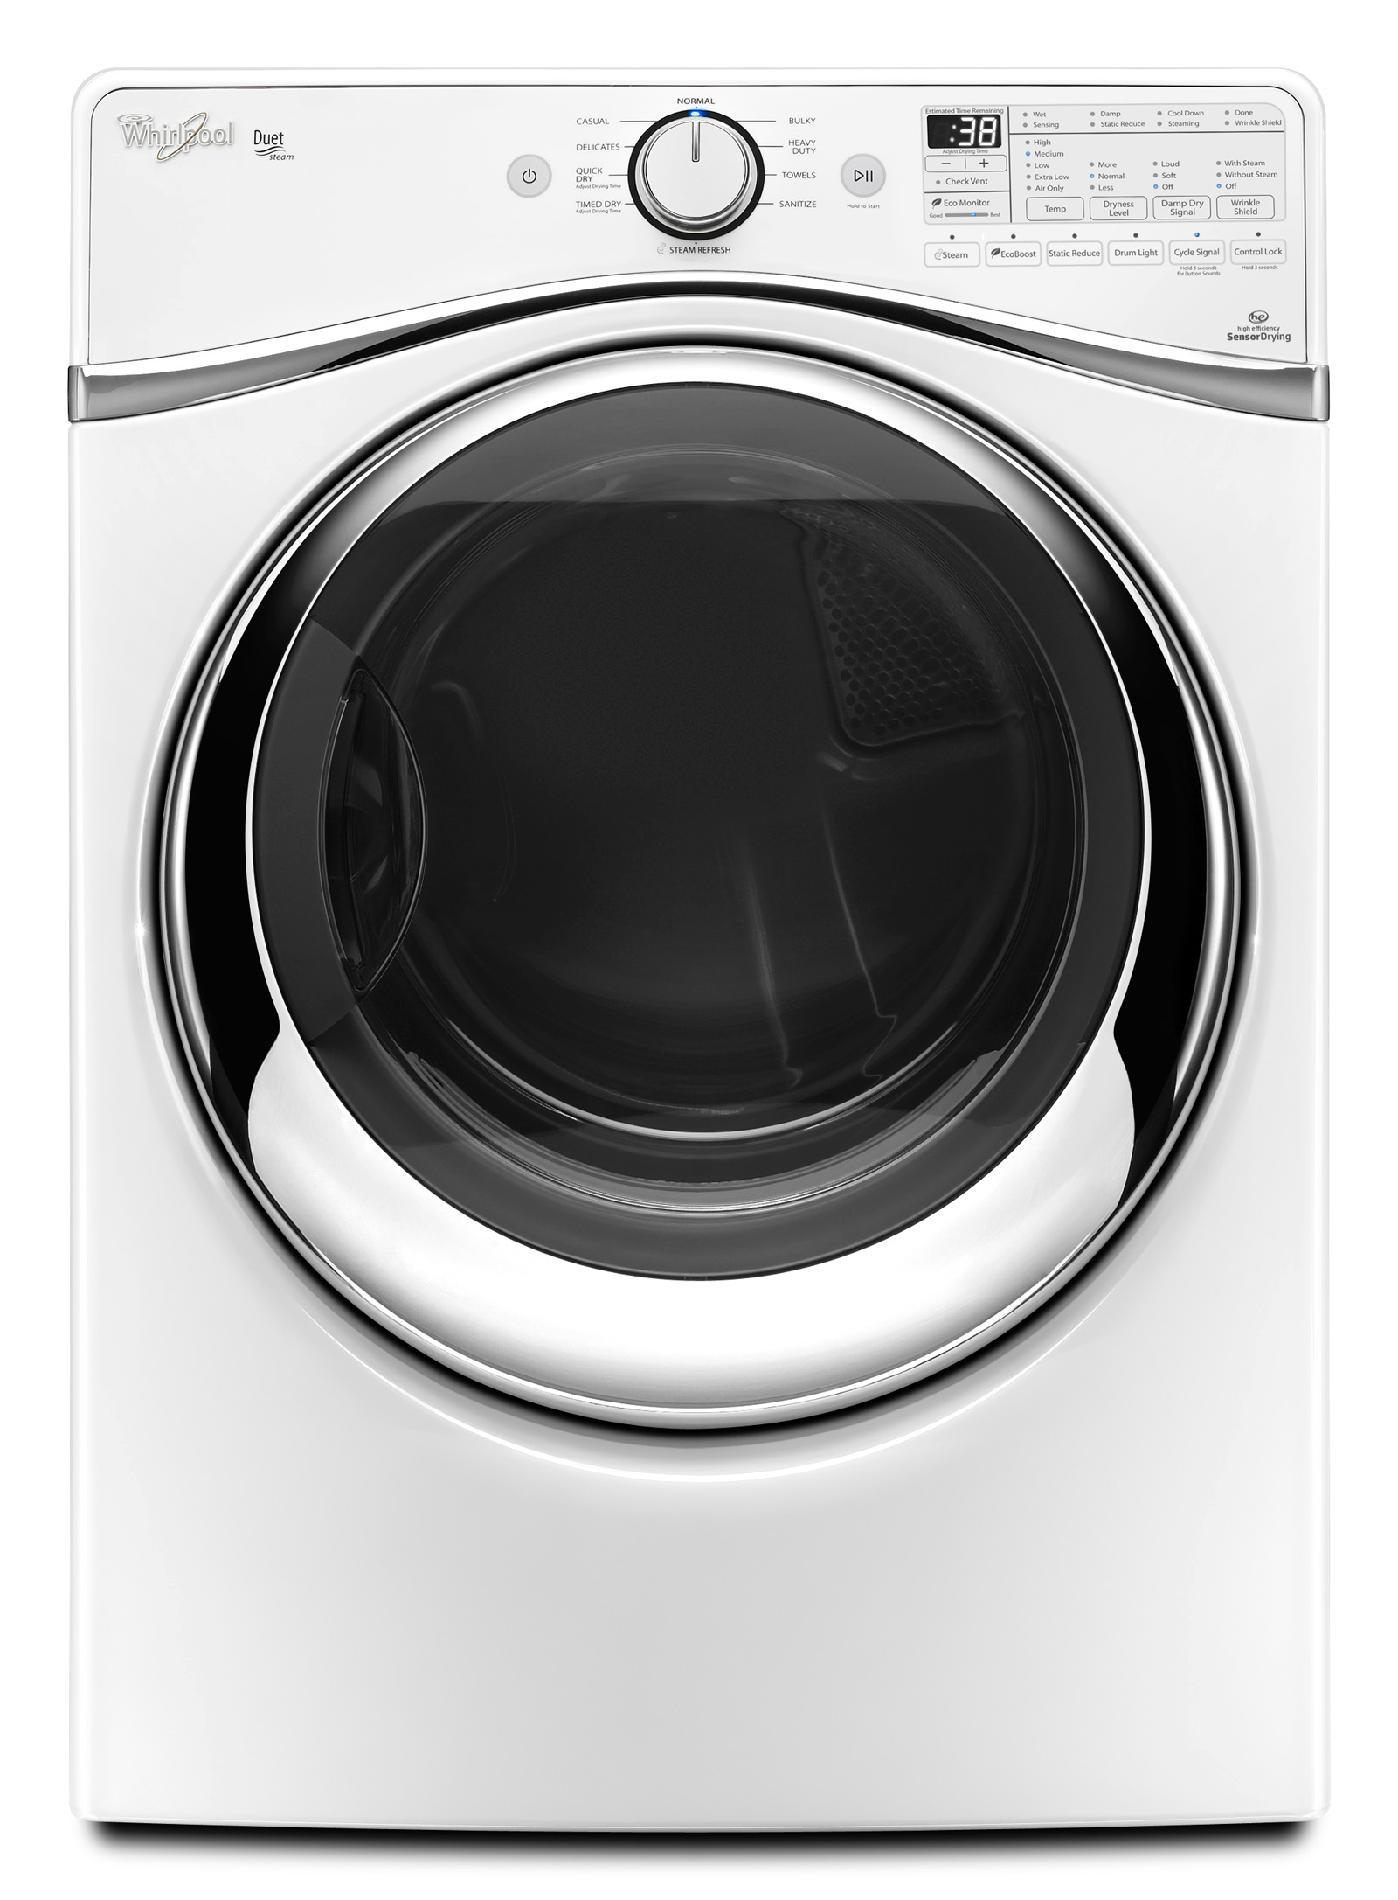 Whirlpool 7.4 cu. ft. Duet® Electric Dryer w/ SilentSteel™ Drum - White